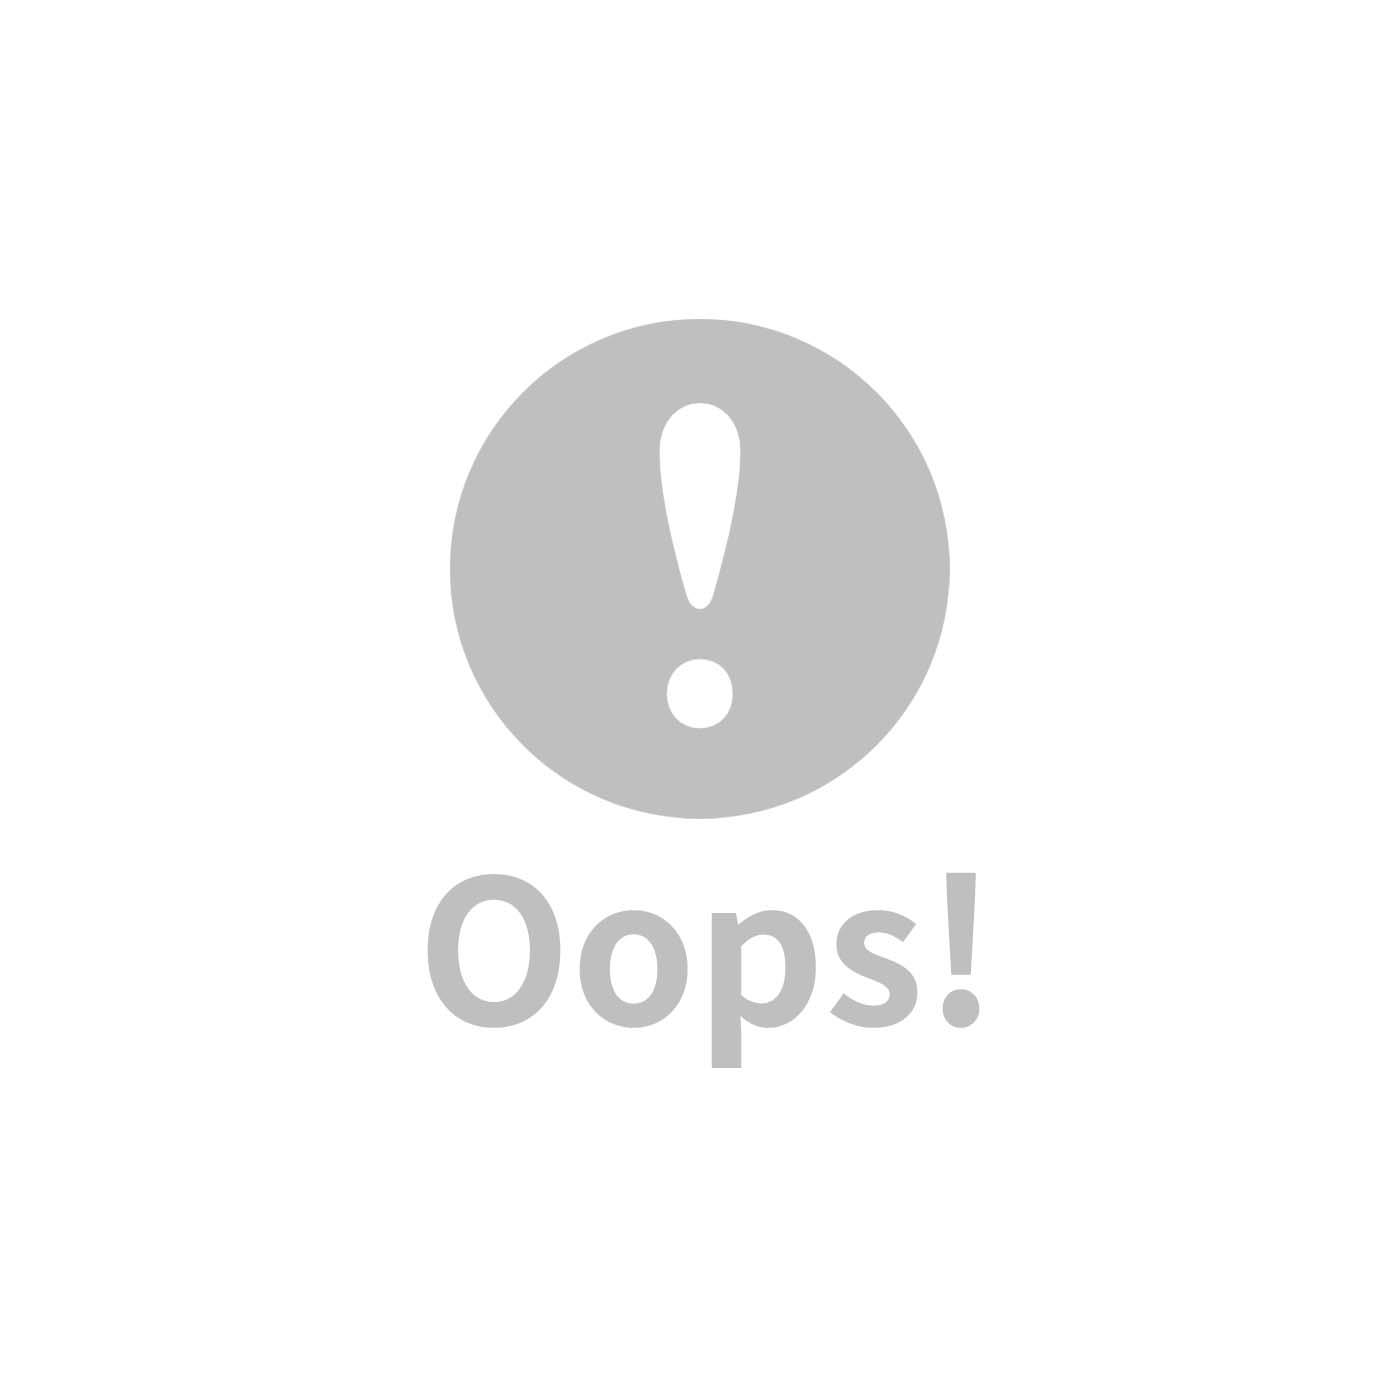 Milo&Gabby部落客盧小蜜團購超夯品-Milo&Gabby 動物好朋友-三合一超柔軟四季睡袋 /幼稚園午睡睡袋